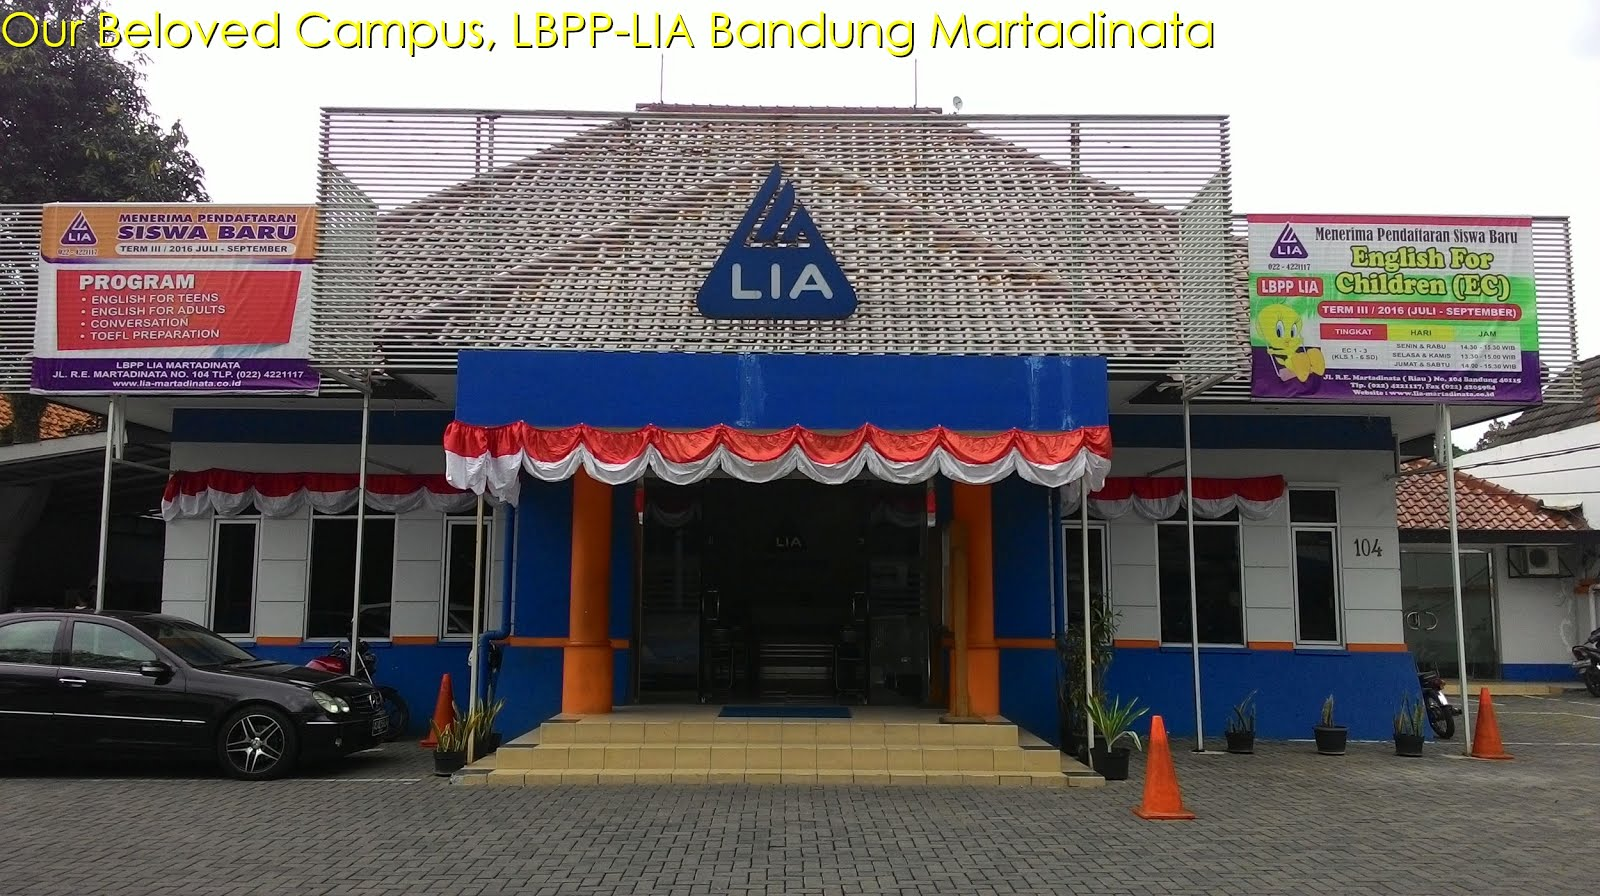 LBPP-LIA BANDUNG